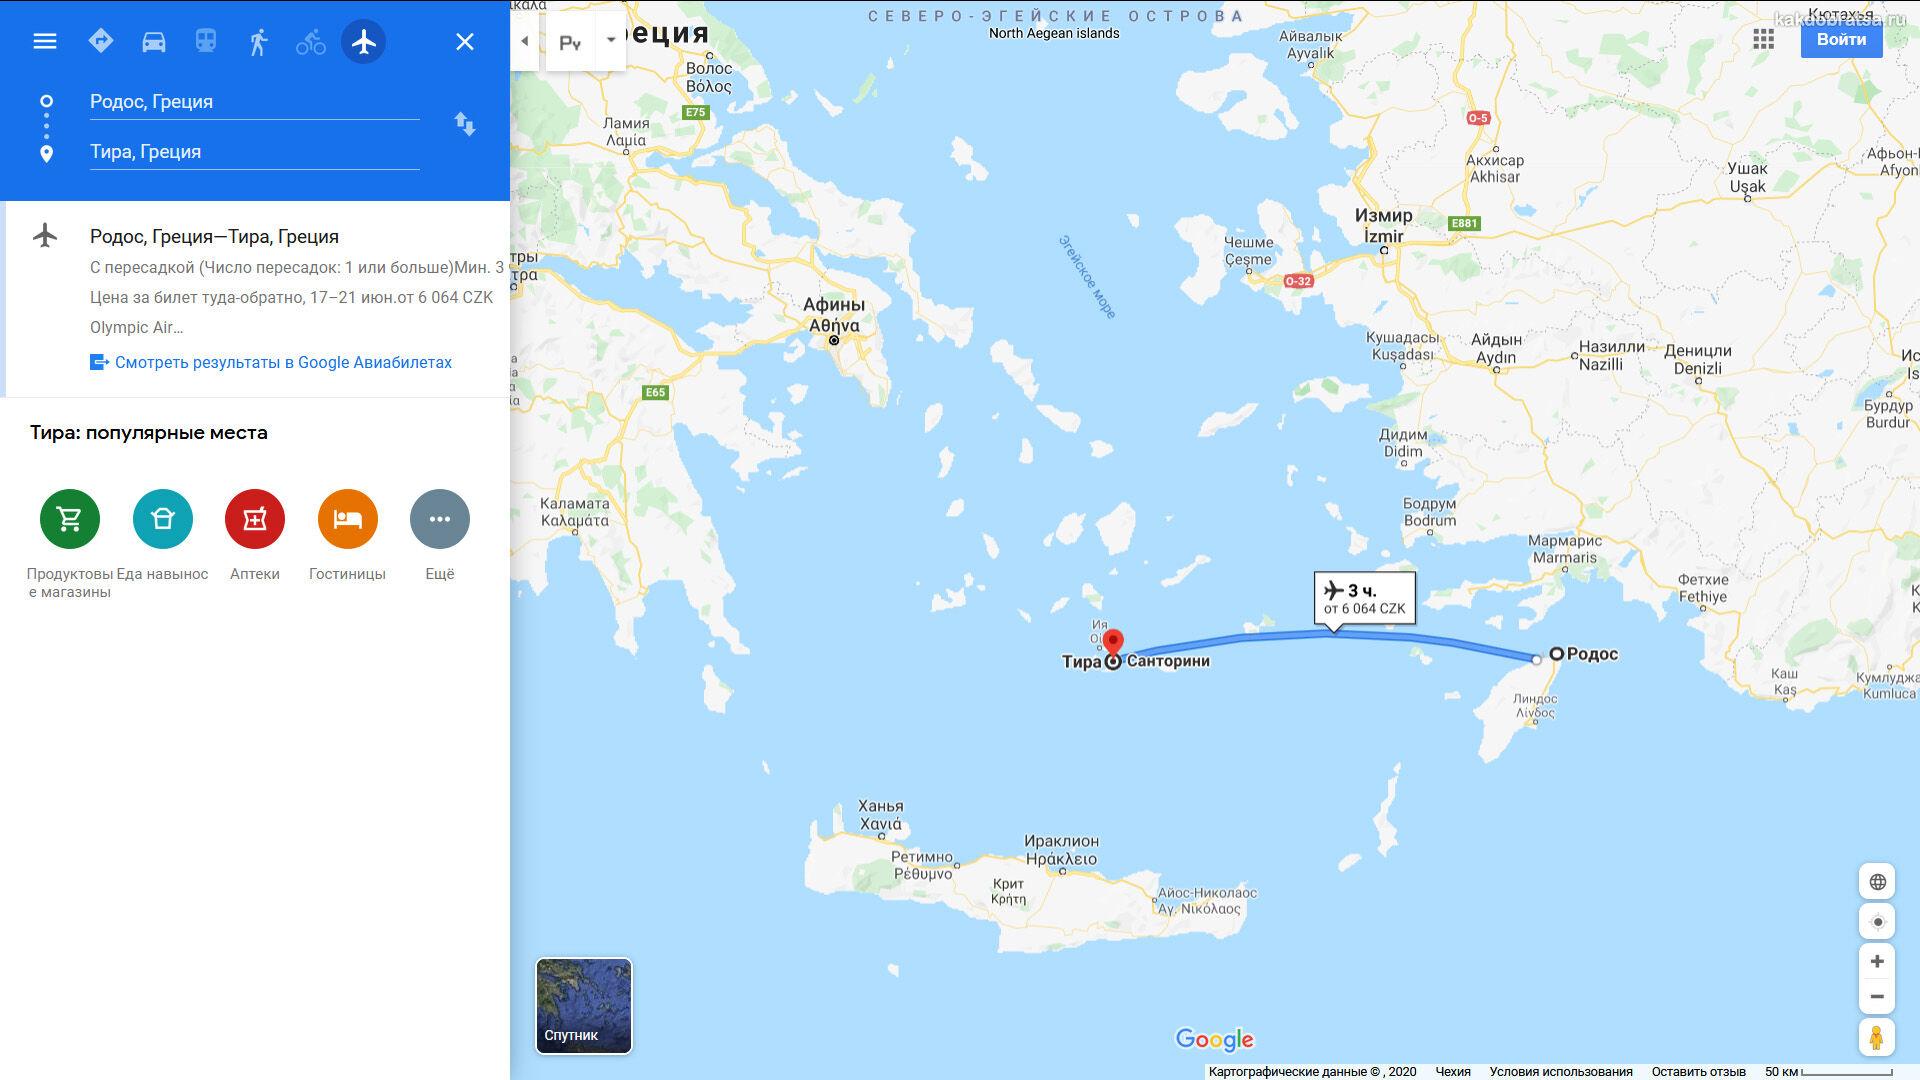 Как добраться с Родоса до Санторини